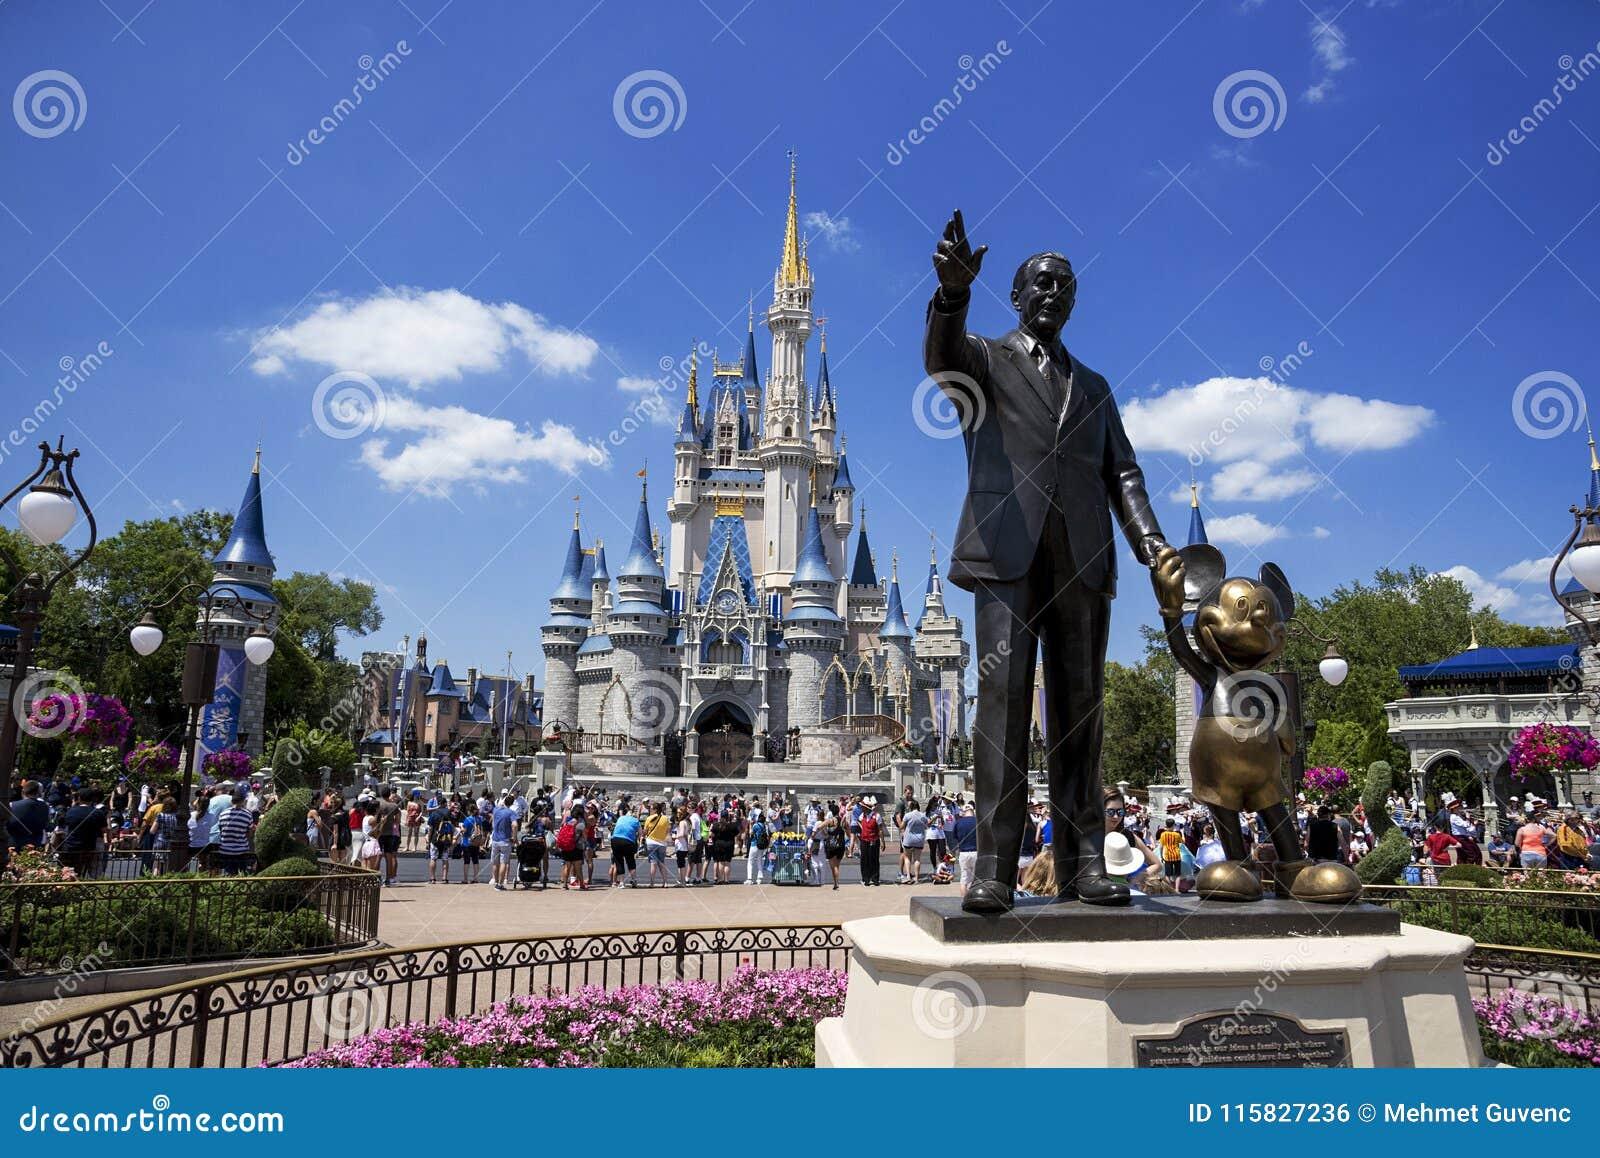 Disney World Castle and Mickey Mouse. Orlando, Florida.